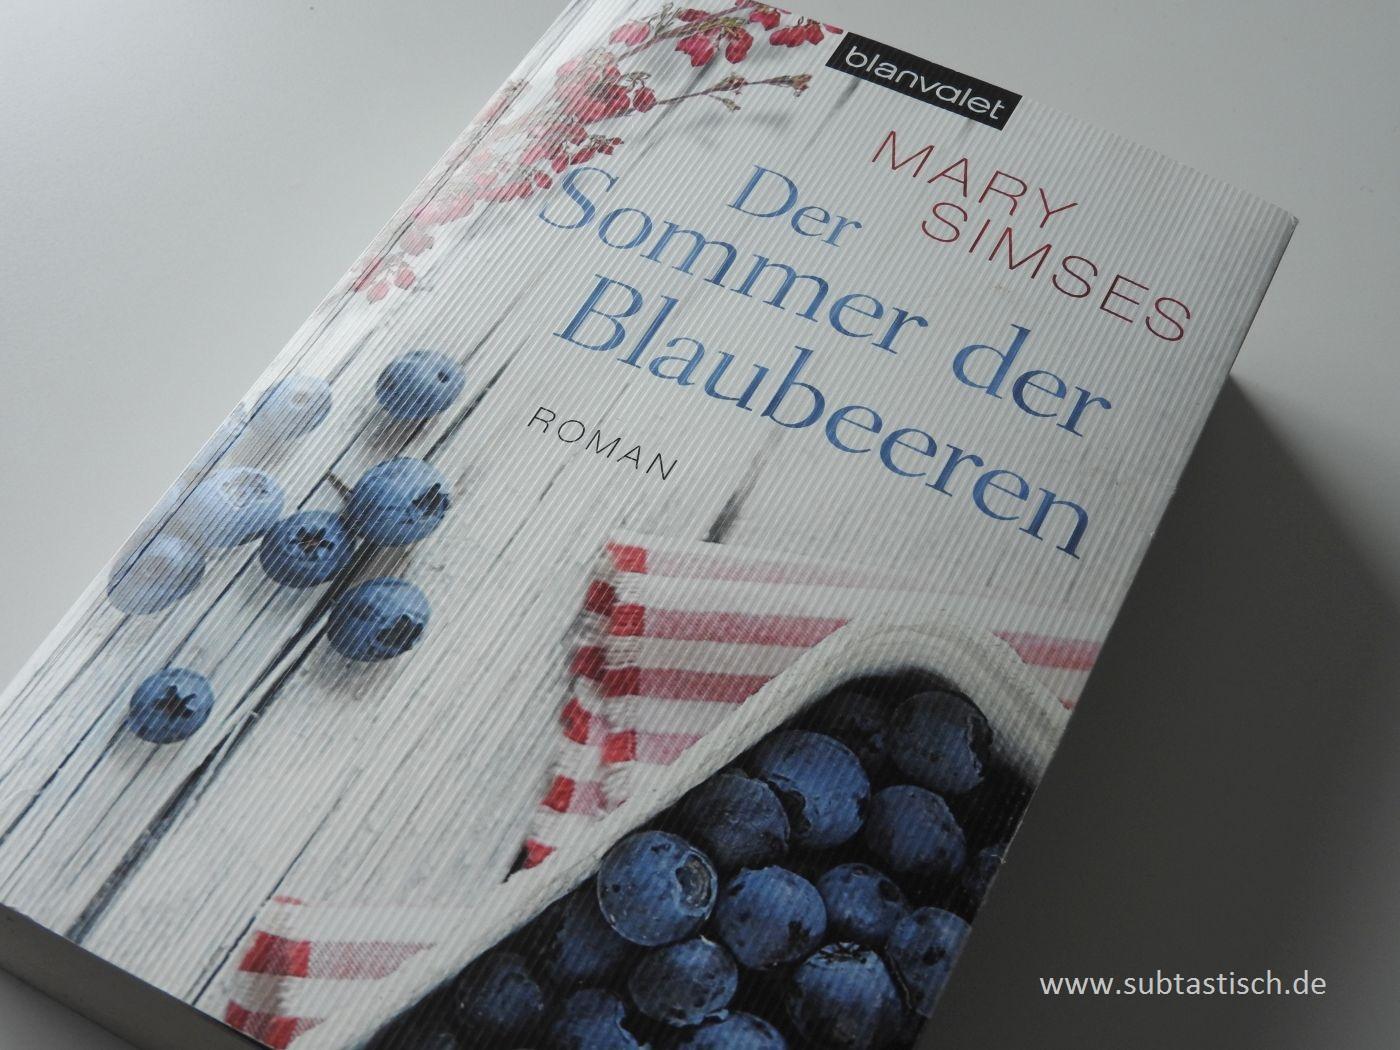 Mary Simses Sommer der Blaubeeren